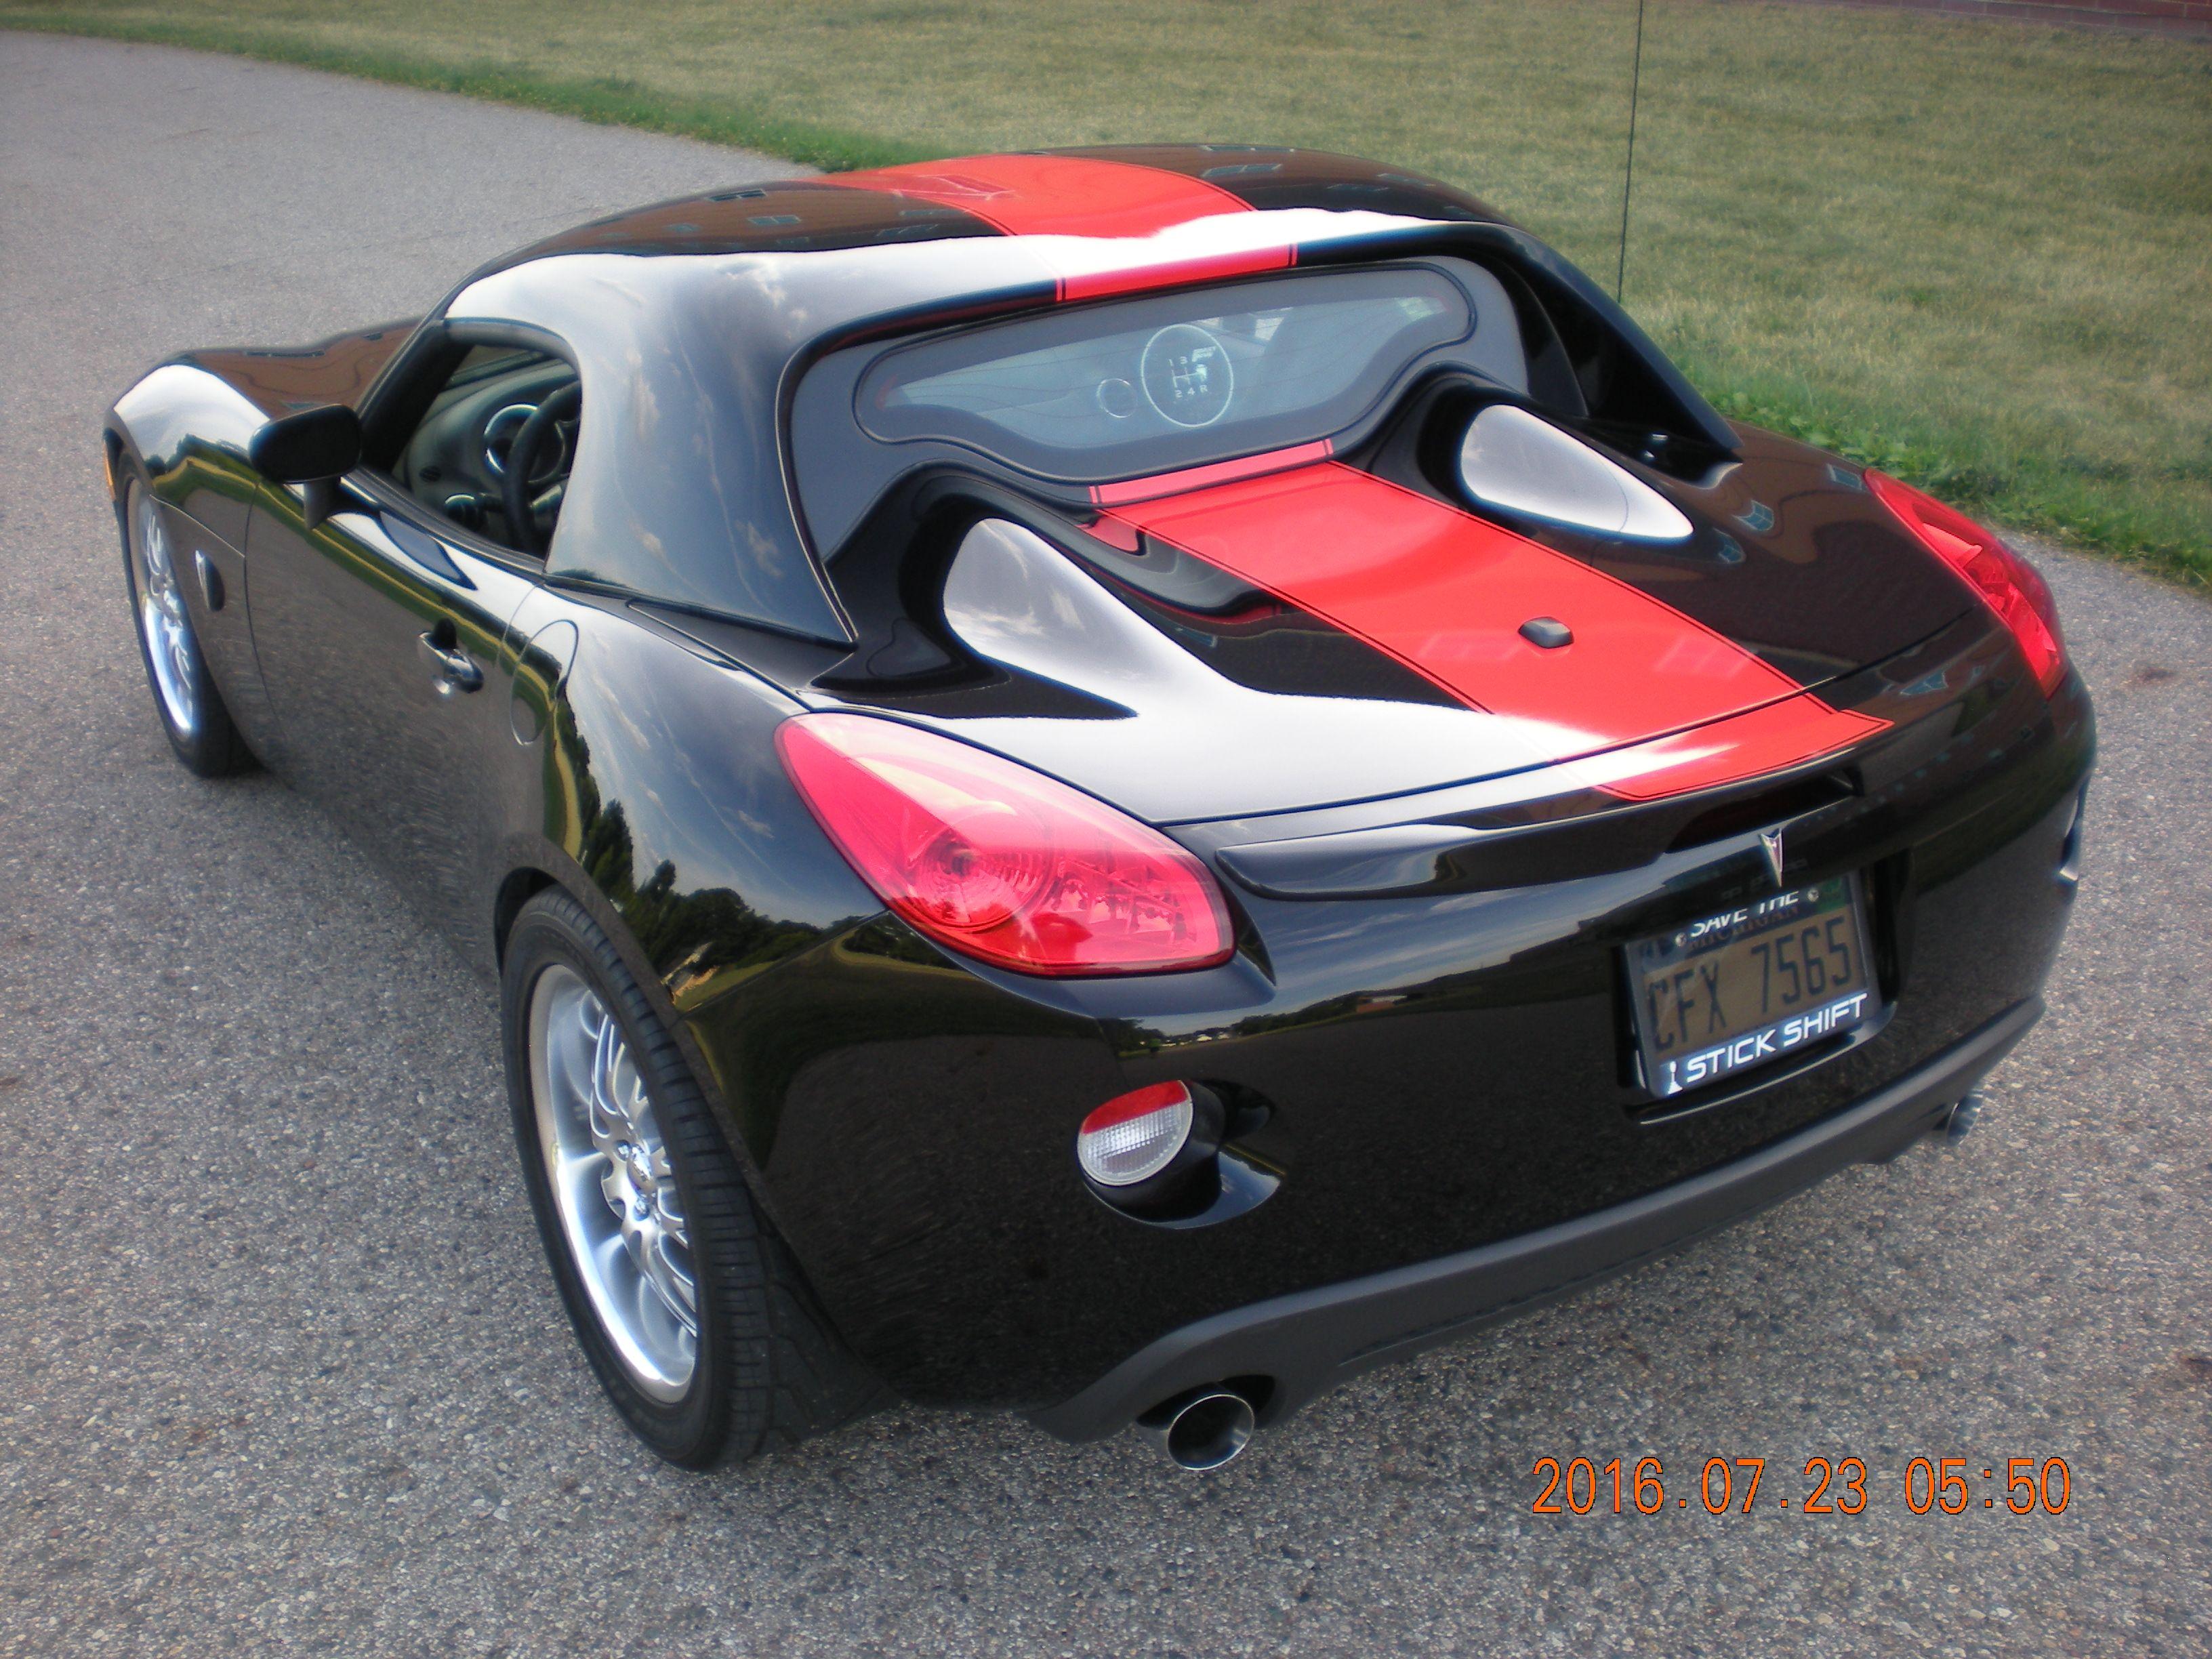 2006 Pontiac Solstice Street Edition headlamps Street Edition Red